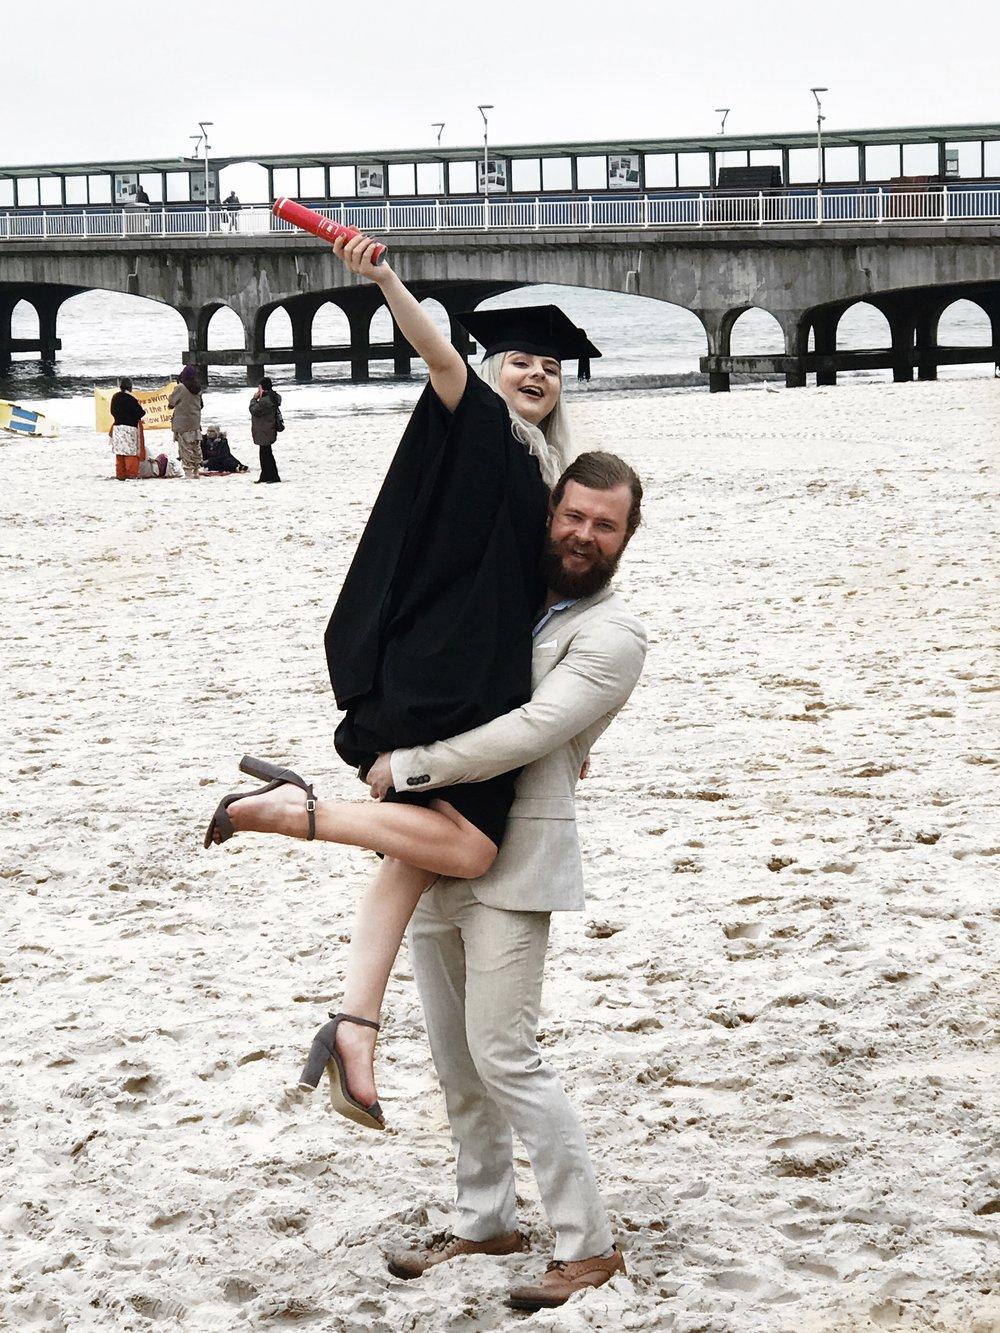 graduation on bournemouth beach